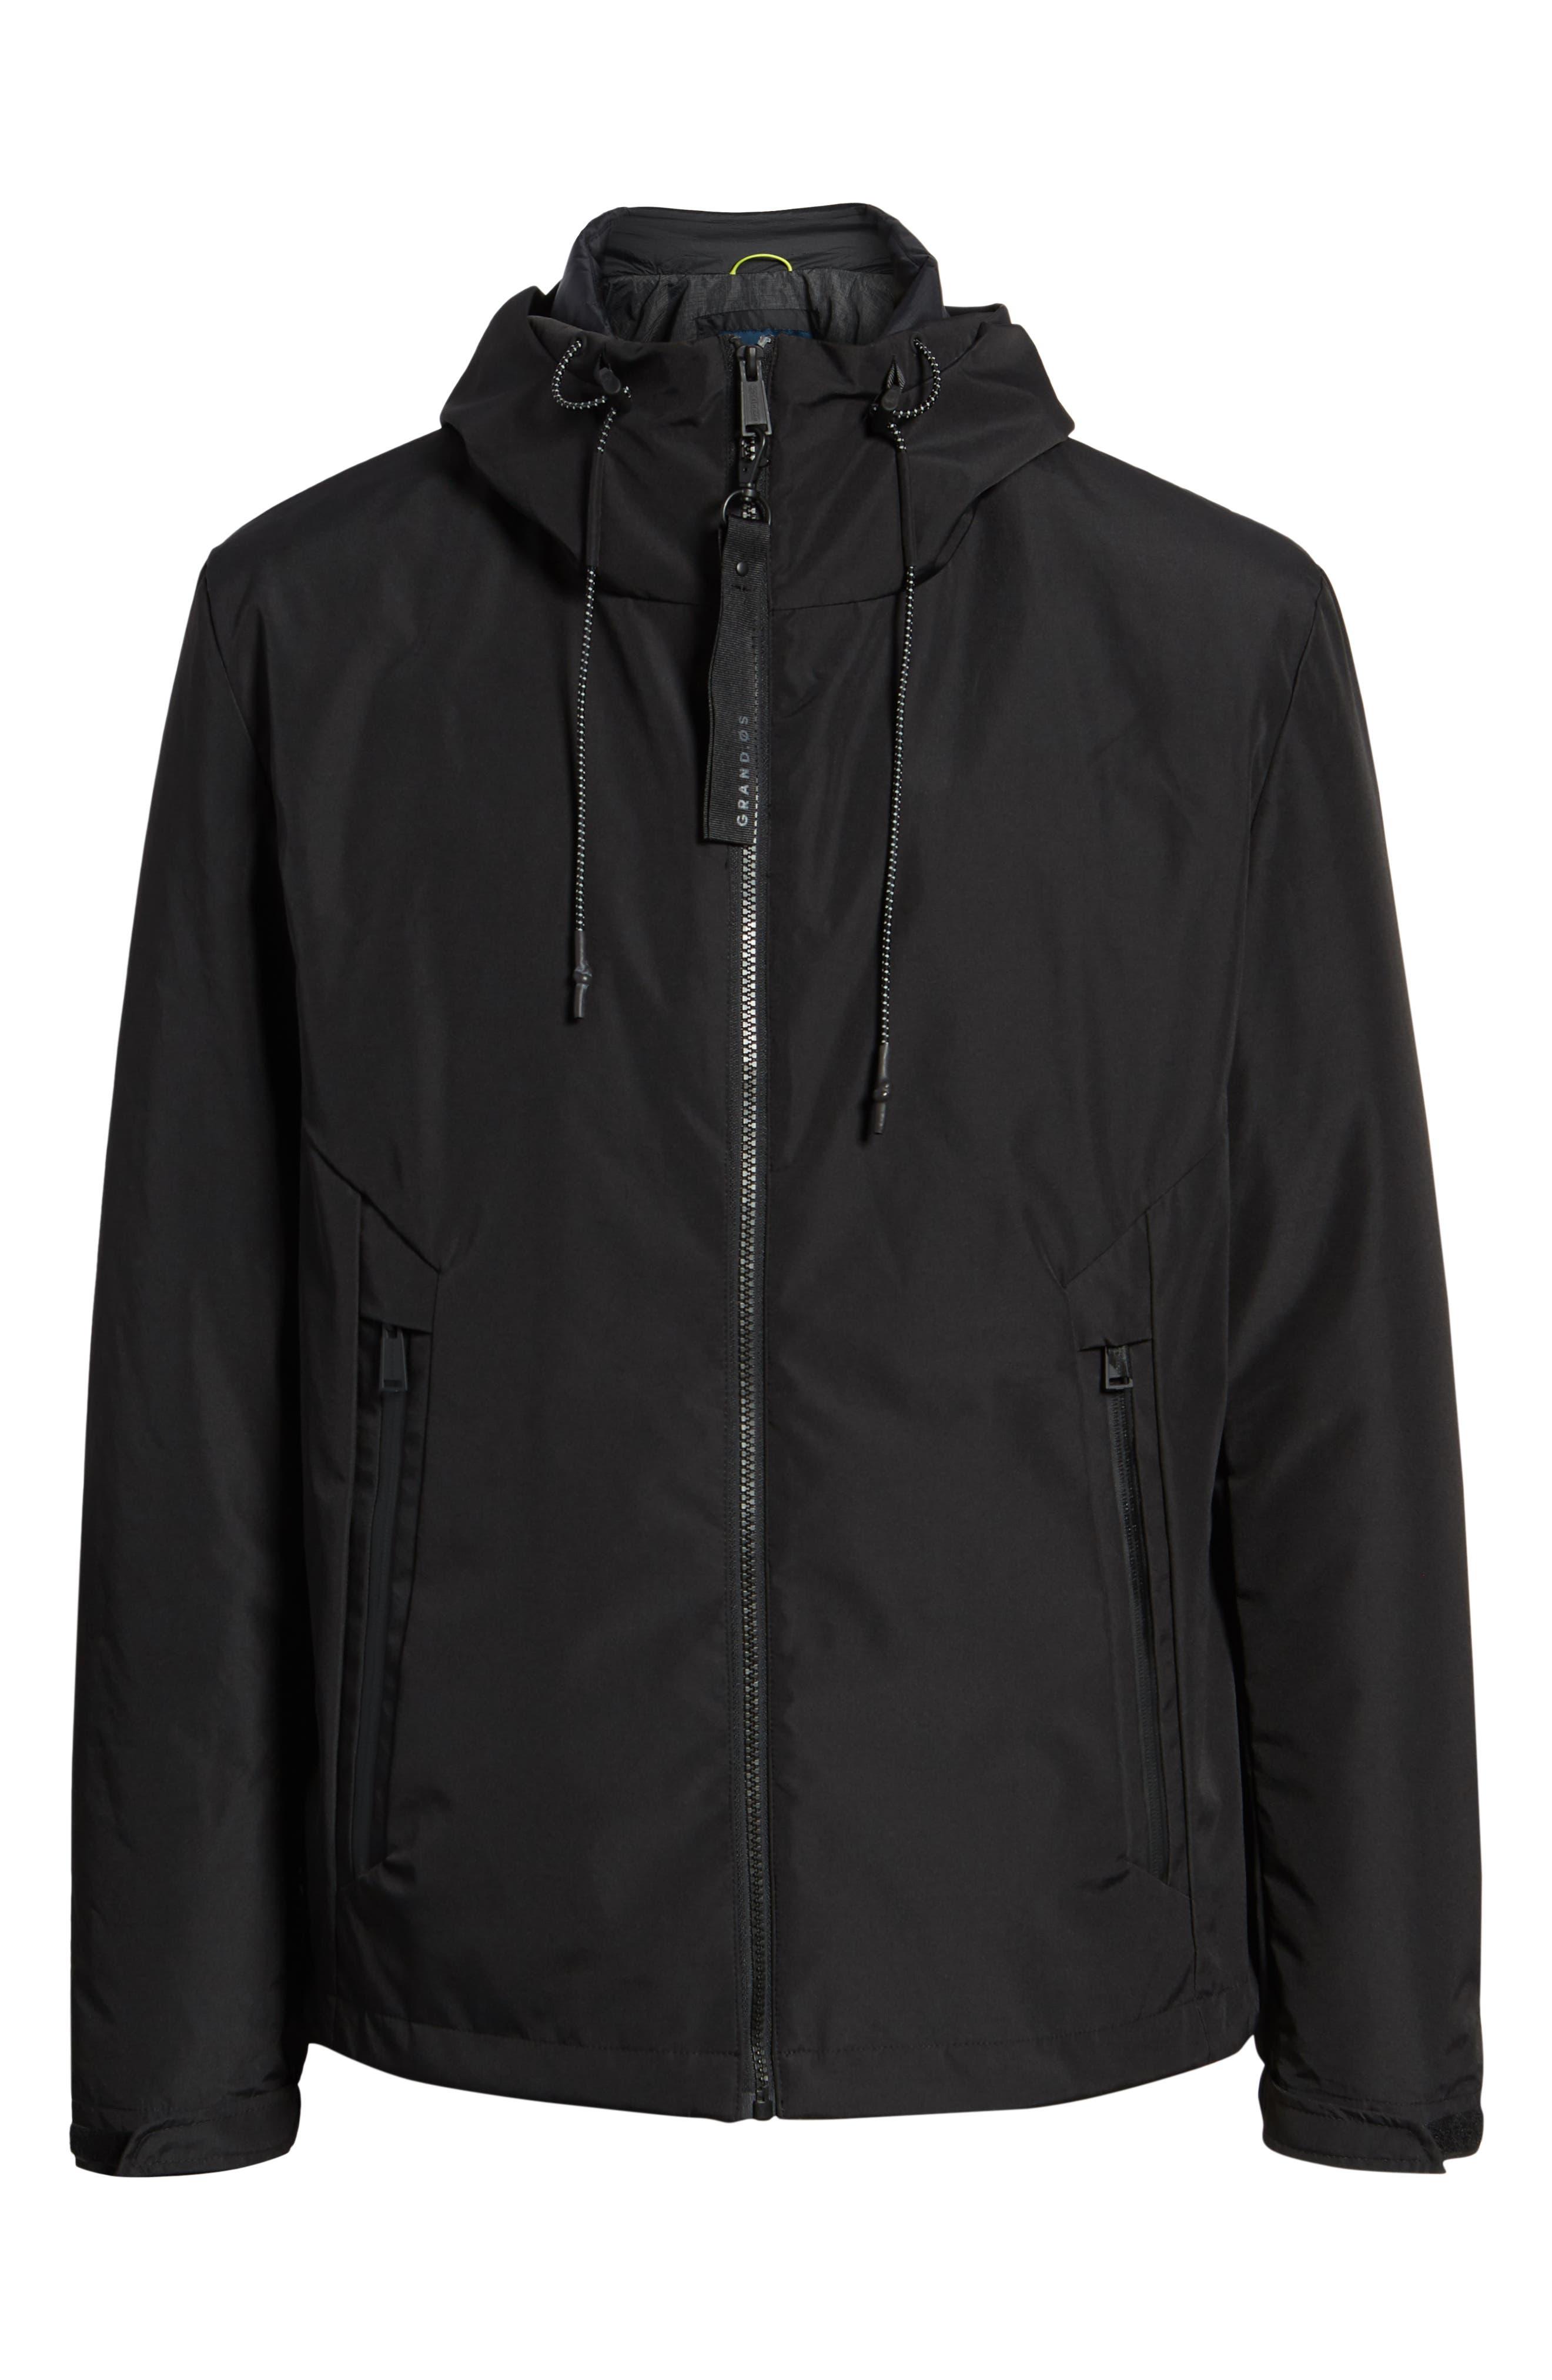 3-in-1 Rain Jacket,                             Alternate thumbnail 7, color,                             BLACK